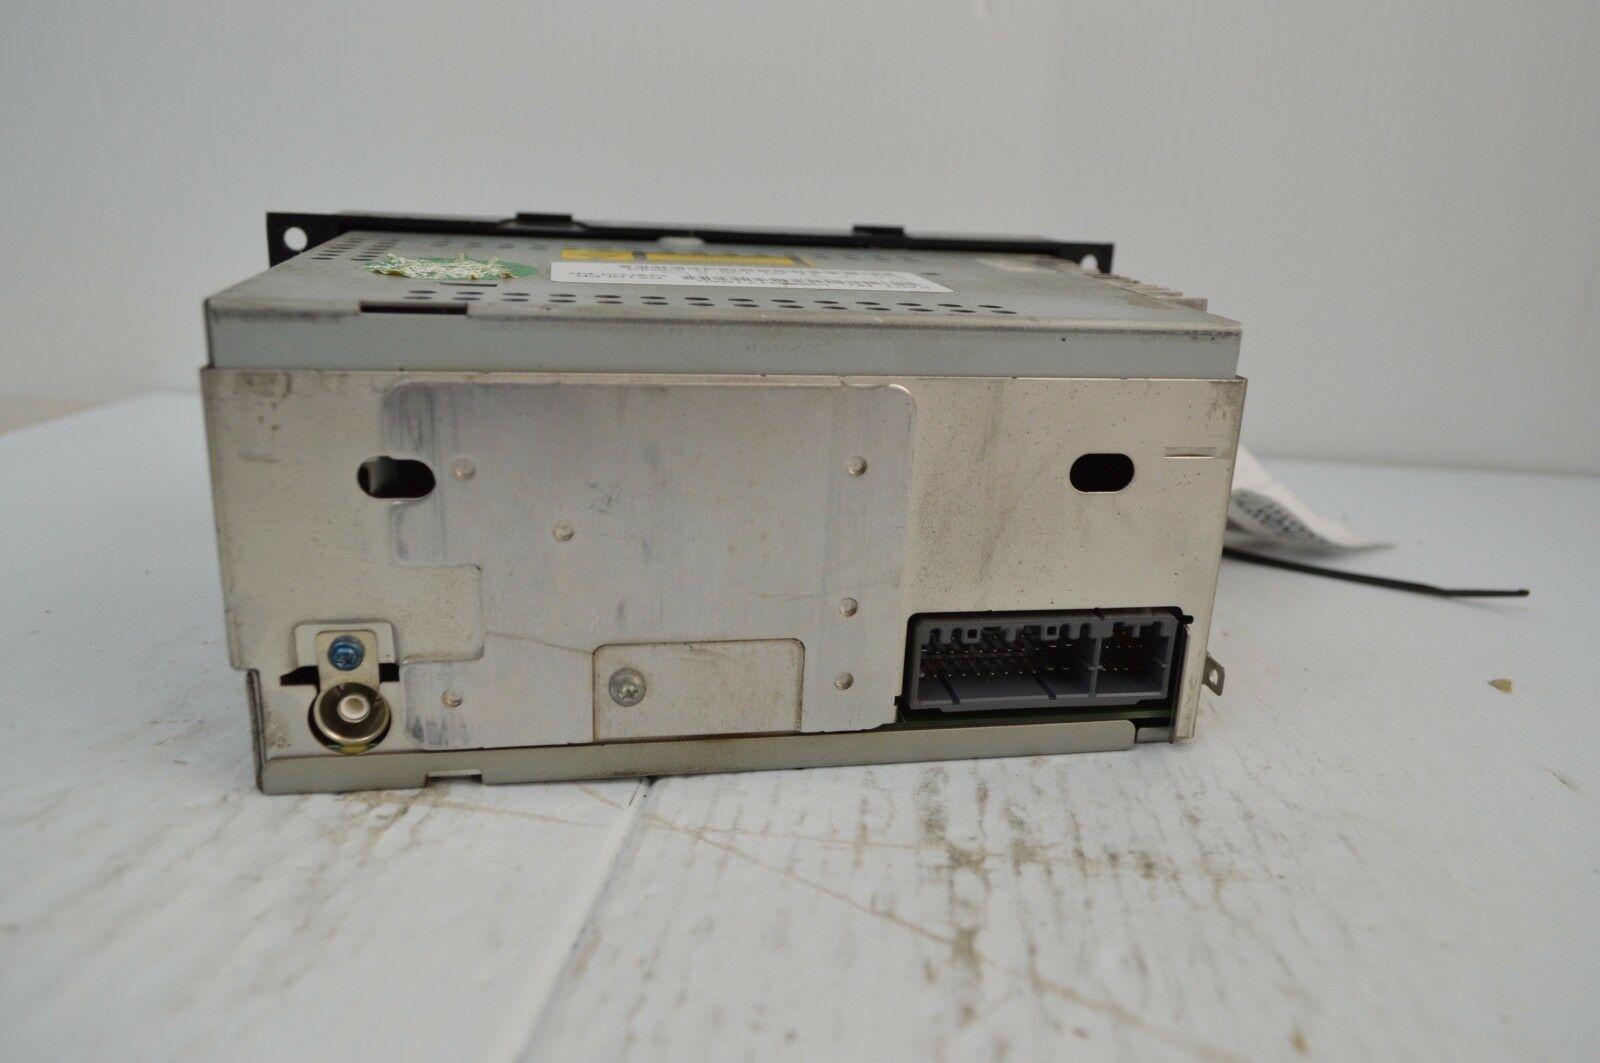 2004-2010 Chrysler Dodge Jeep Radio Cd MP3 AUX IPOD TESTED P05091710AG N49#019 image 5